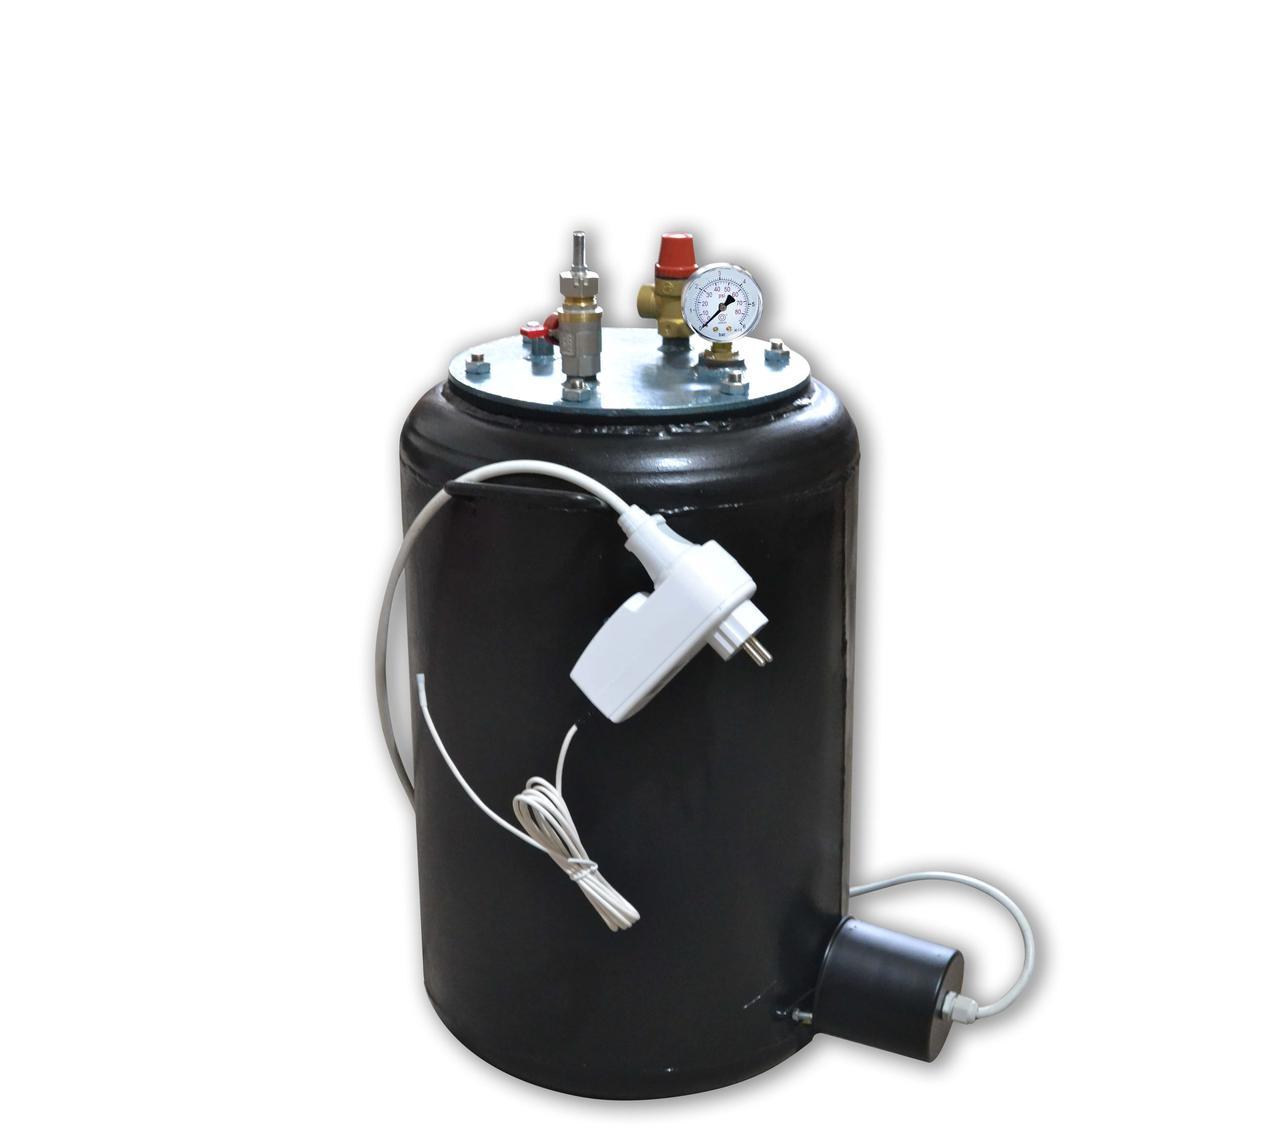 Автоклав электрический УТех-24 electro (1л-14шт, 0,5л-24шт)